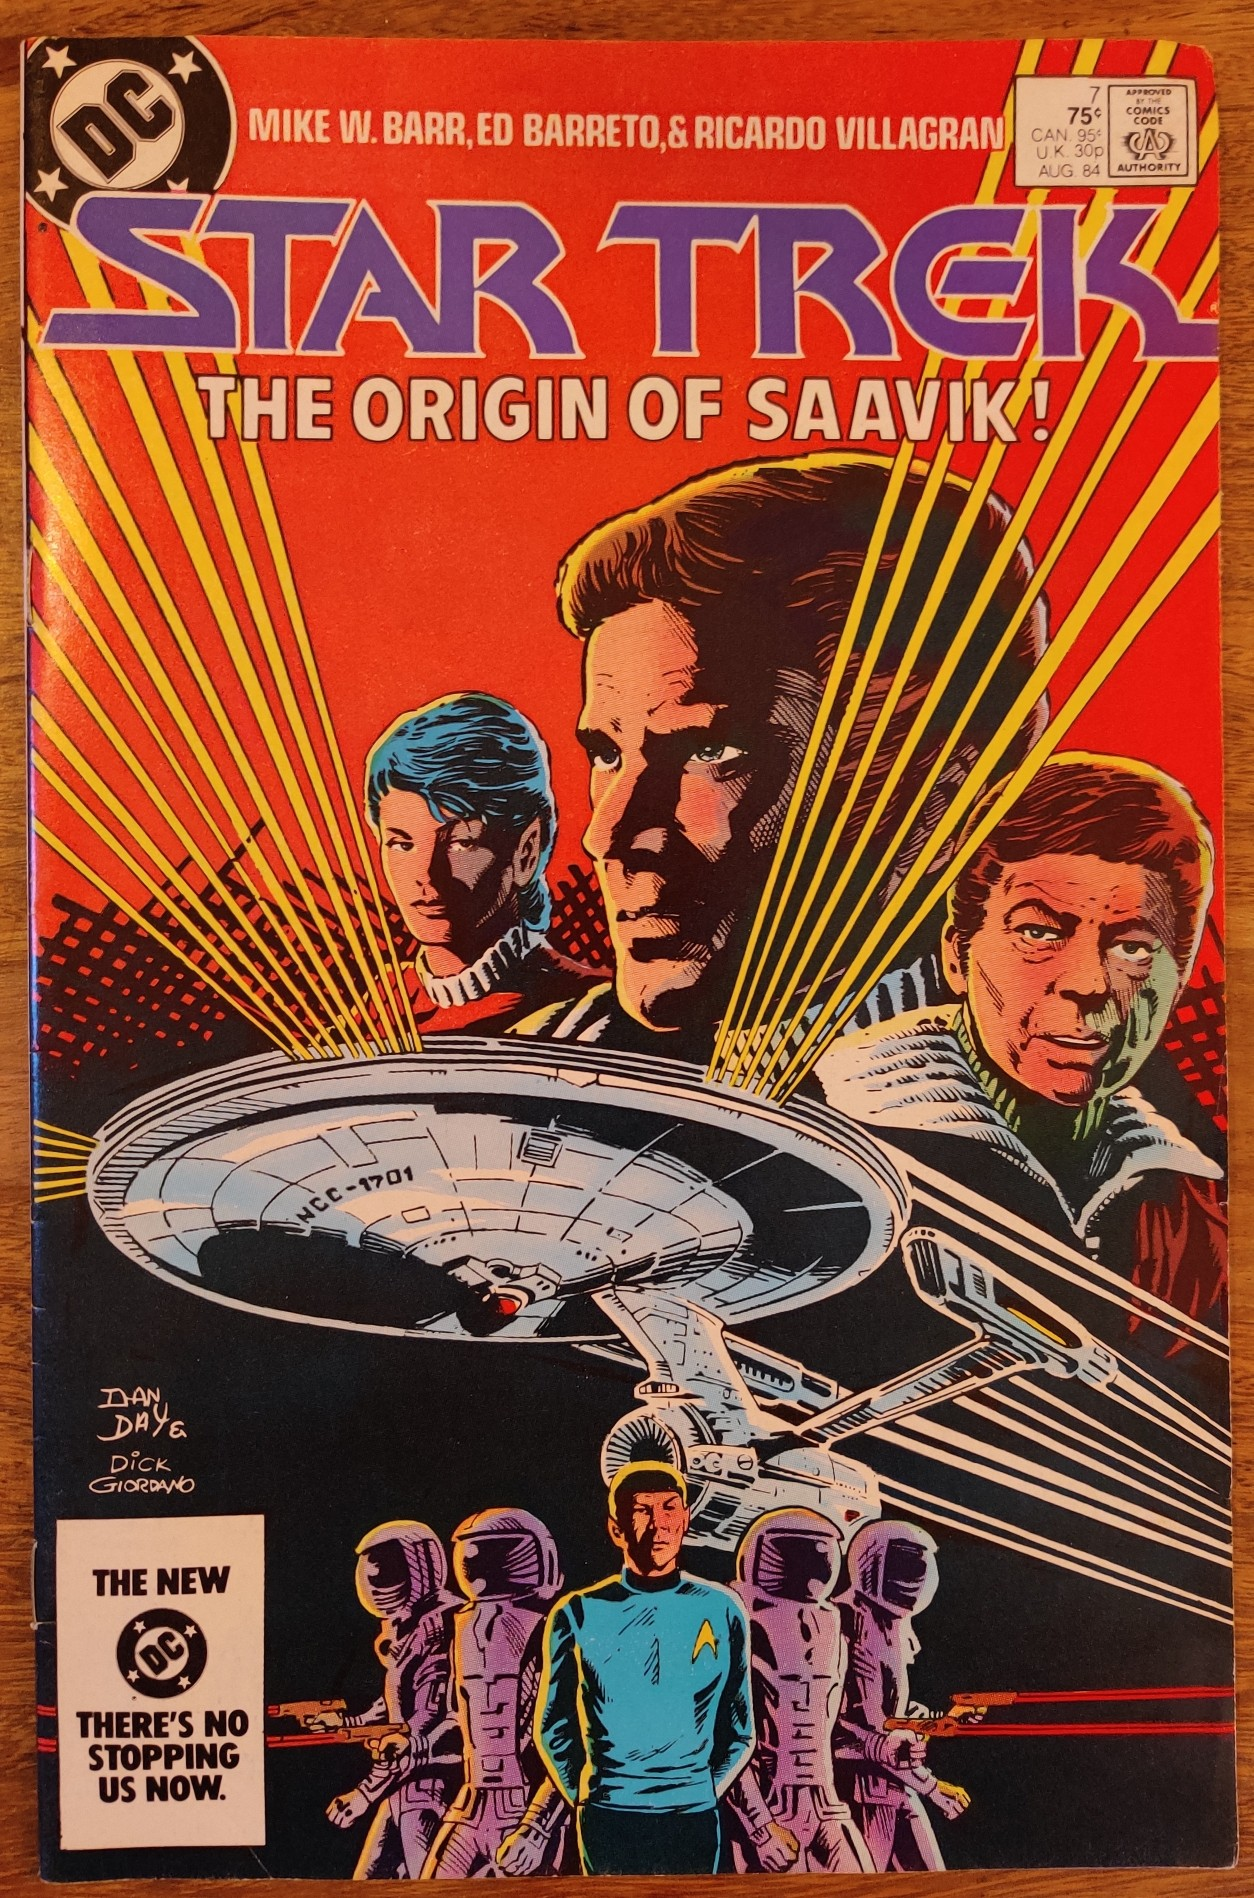 DC Comics Star Trek Issue 6 - Cover